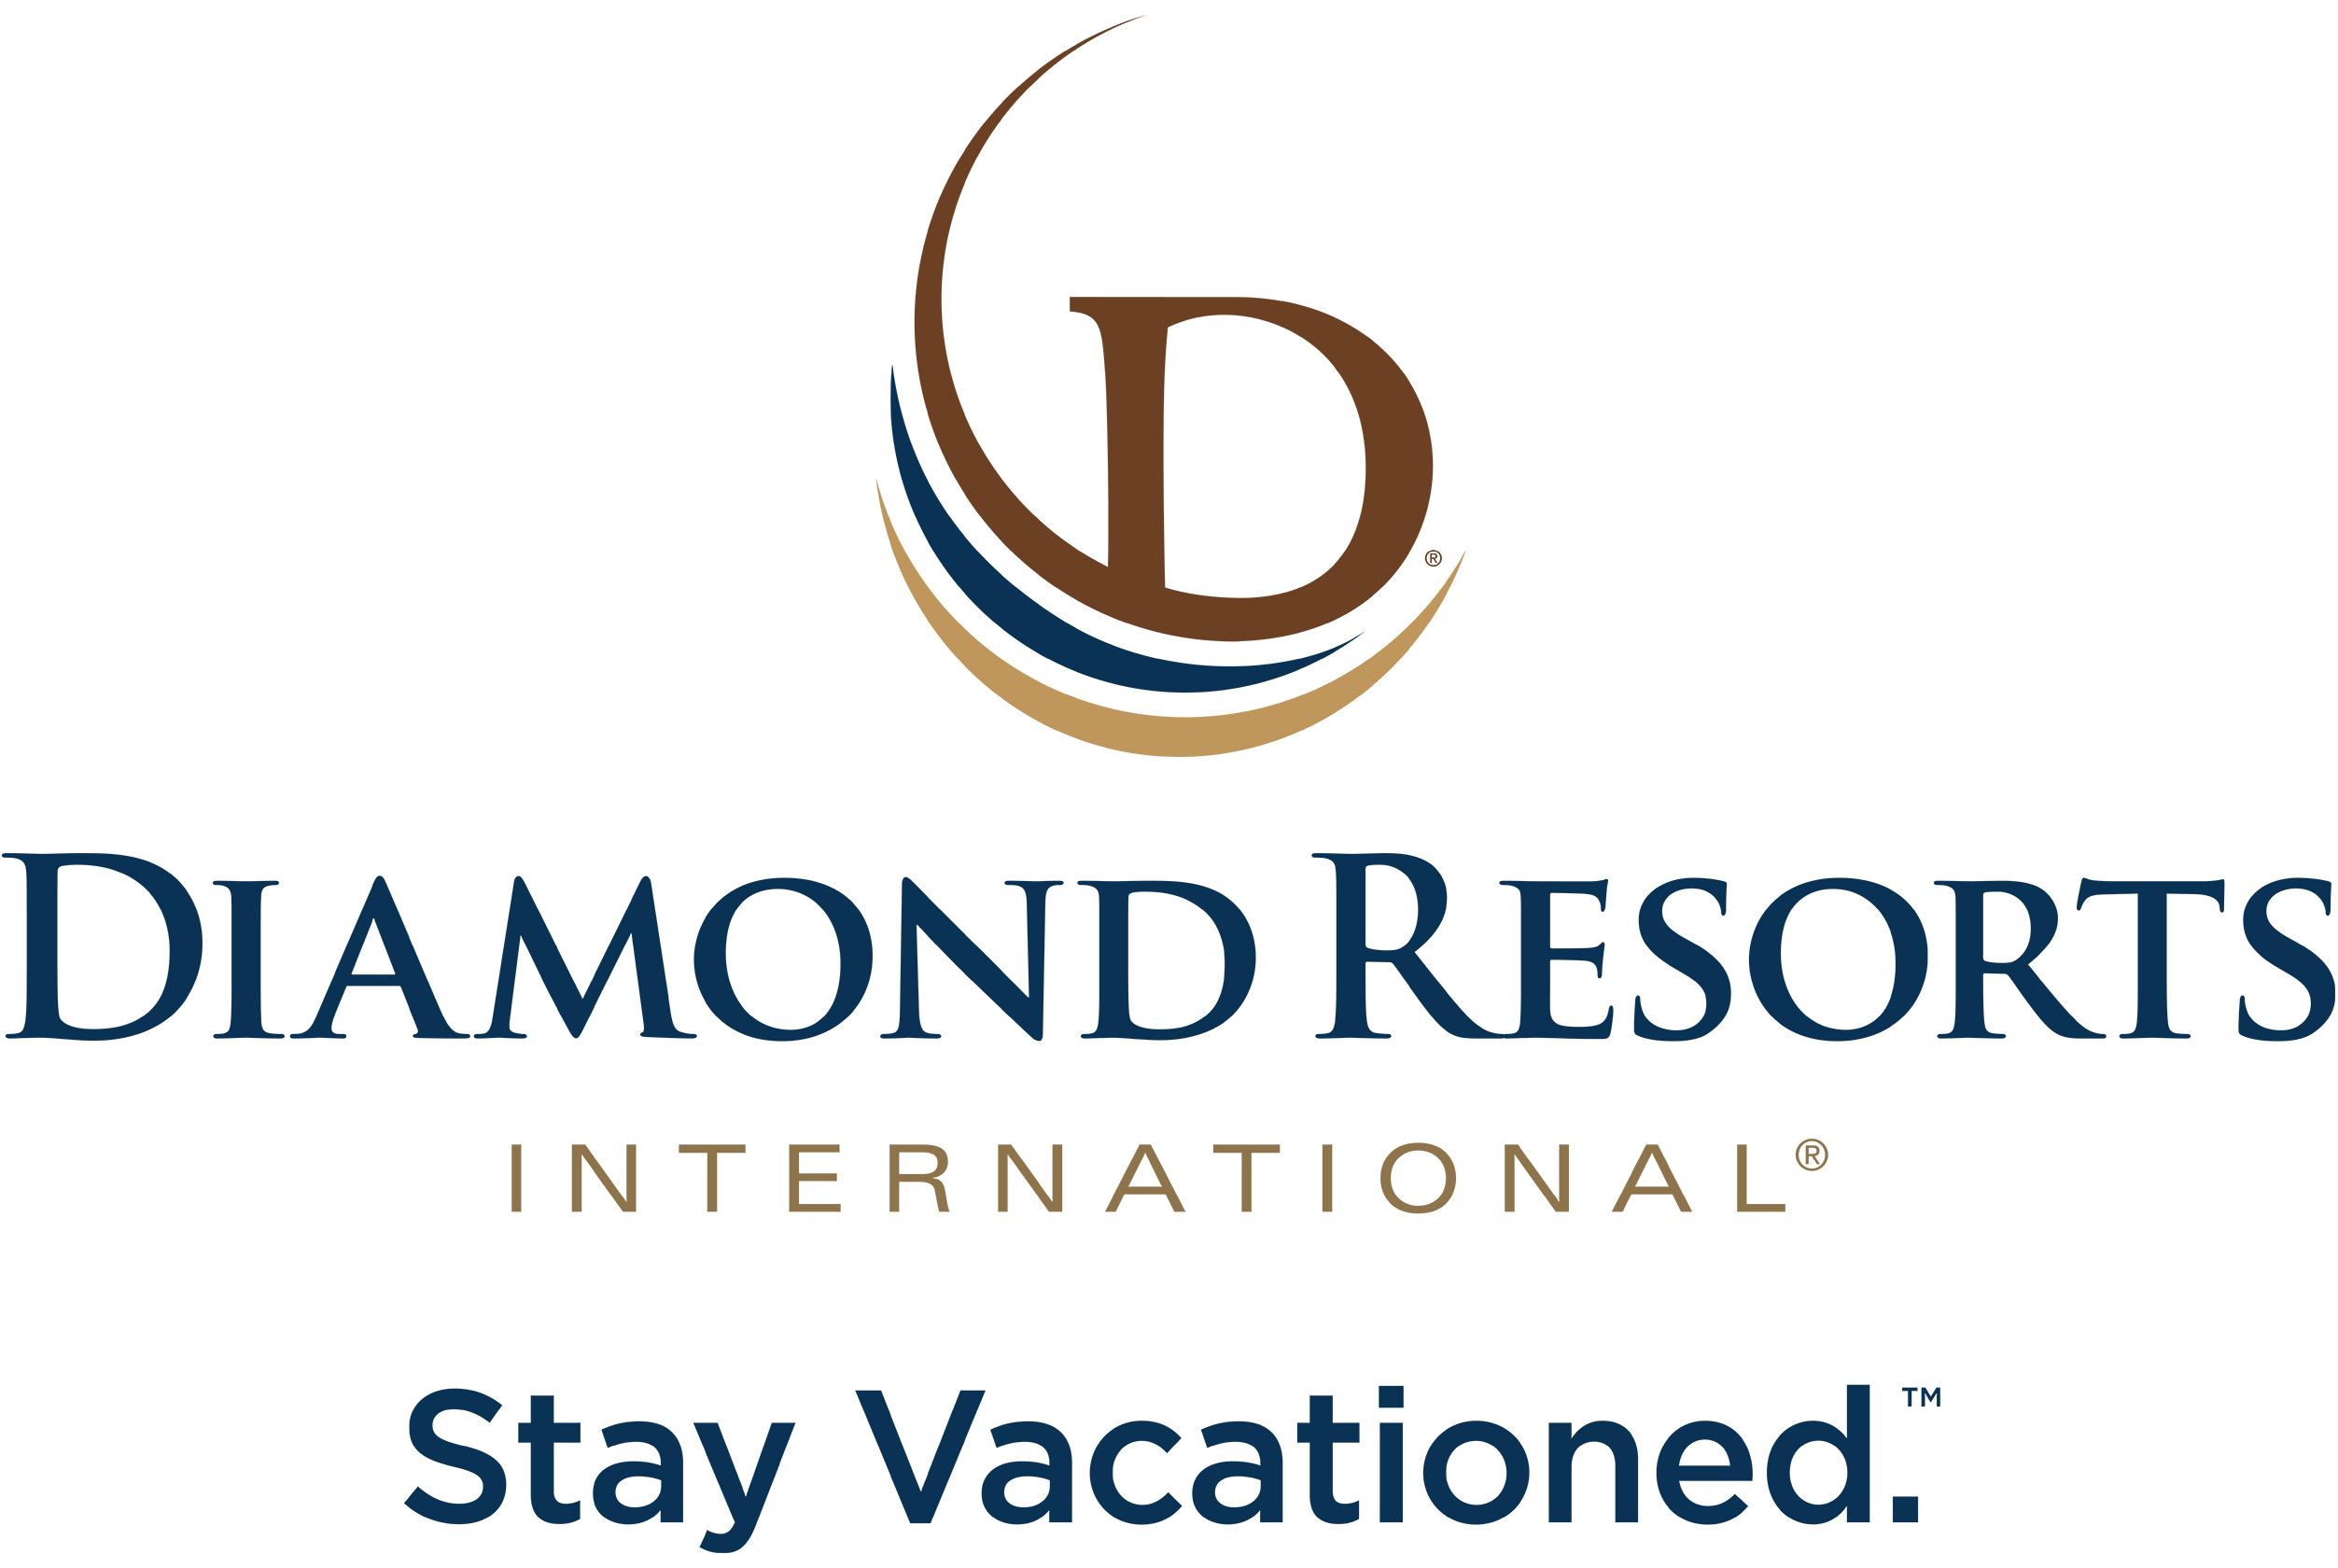 Diamond Resorts | Diamond Resorts Tournament of Champions